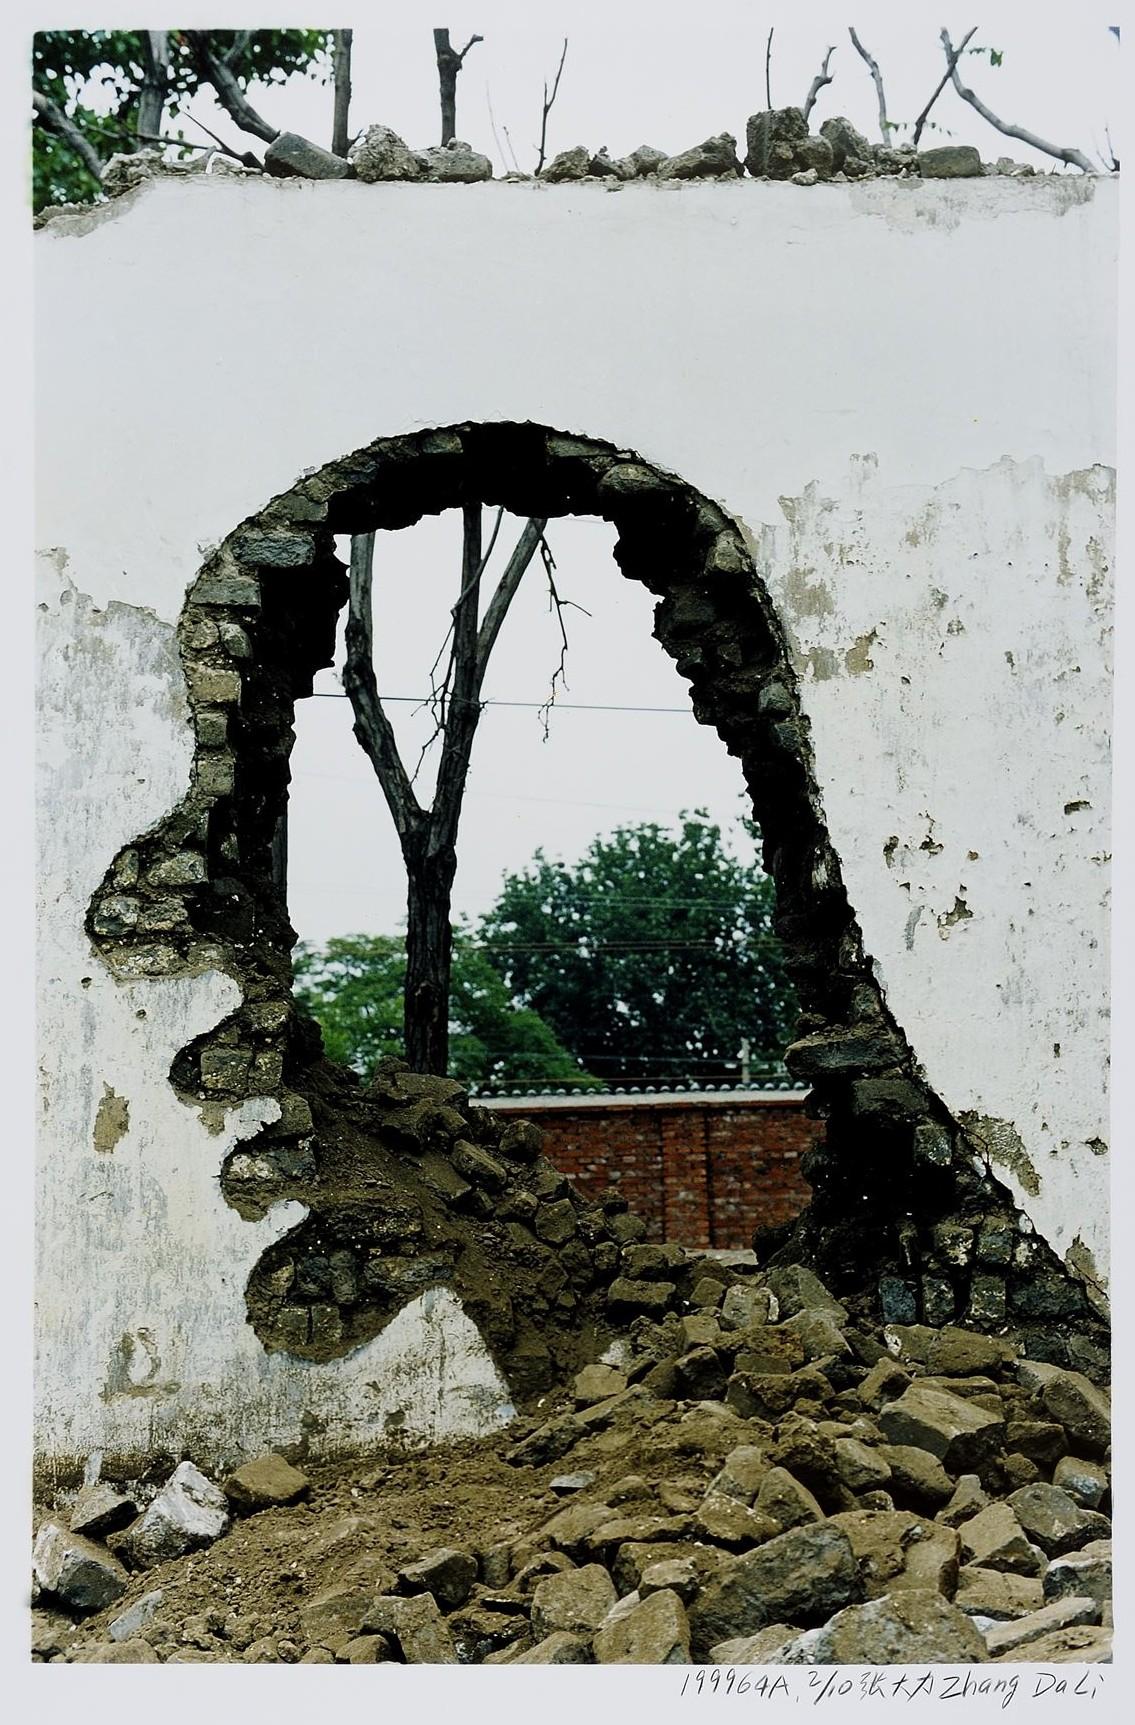 Demolition (Ping'an Avenue Beijing)